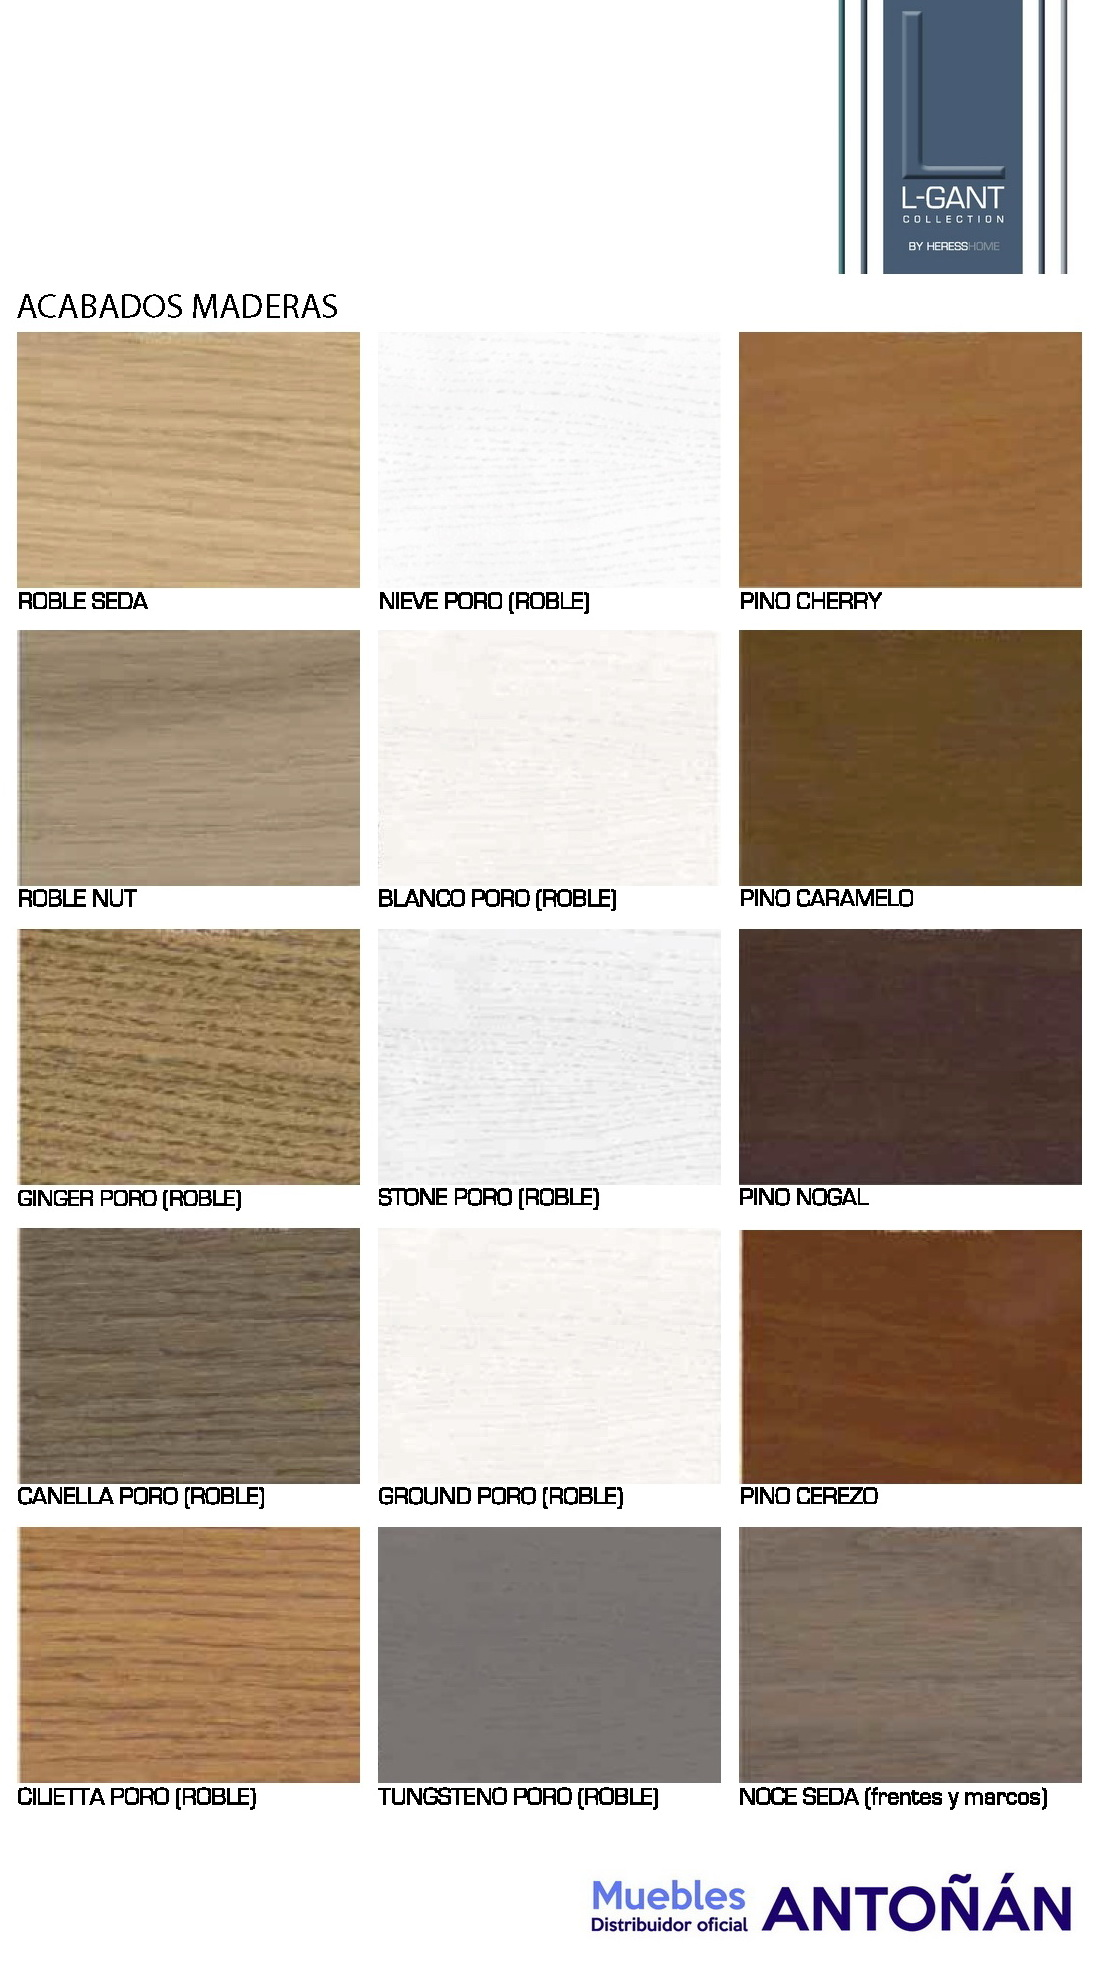 Colores 1 Muebles de Salón LGANT BY HERESS HOME en muebles antoñán® León